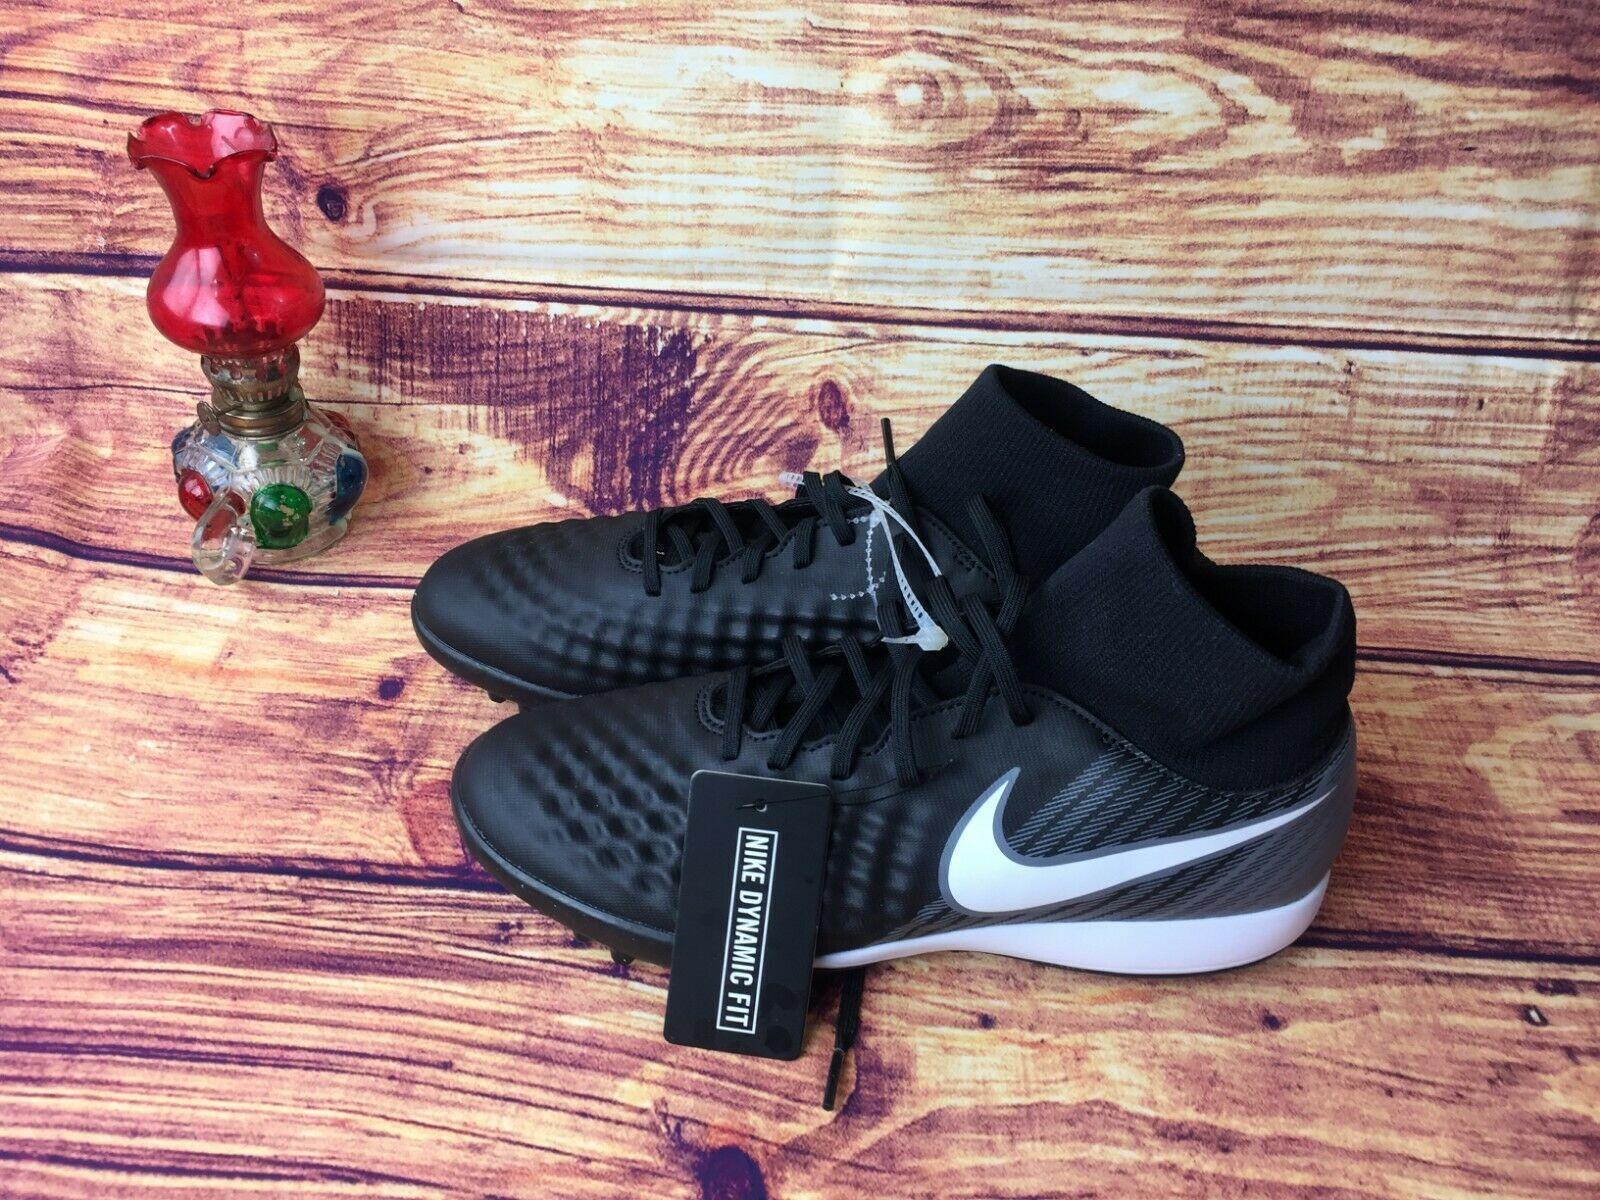 c45de5682 57. 57. Previous. Nike MagistaX Onda II DF TF Turf Soccer Shoes Black ...